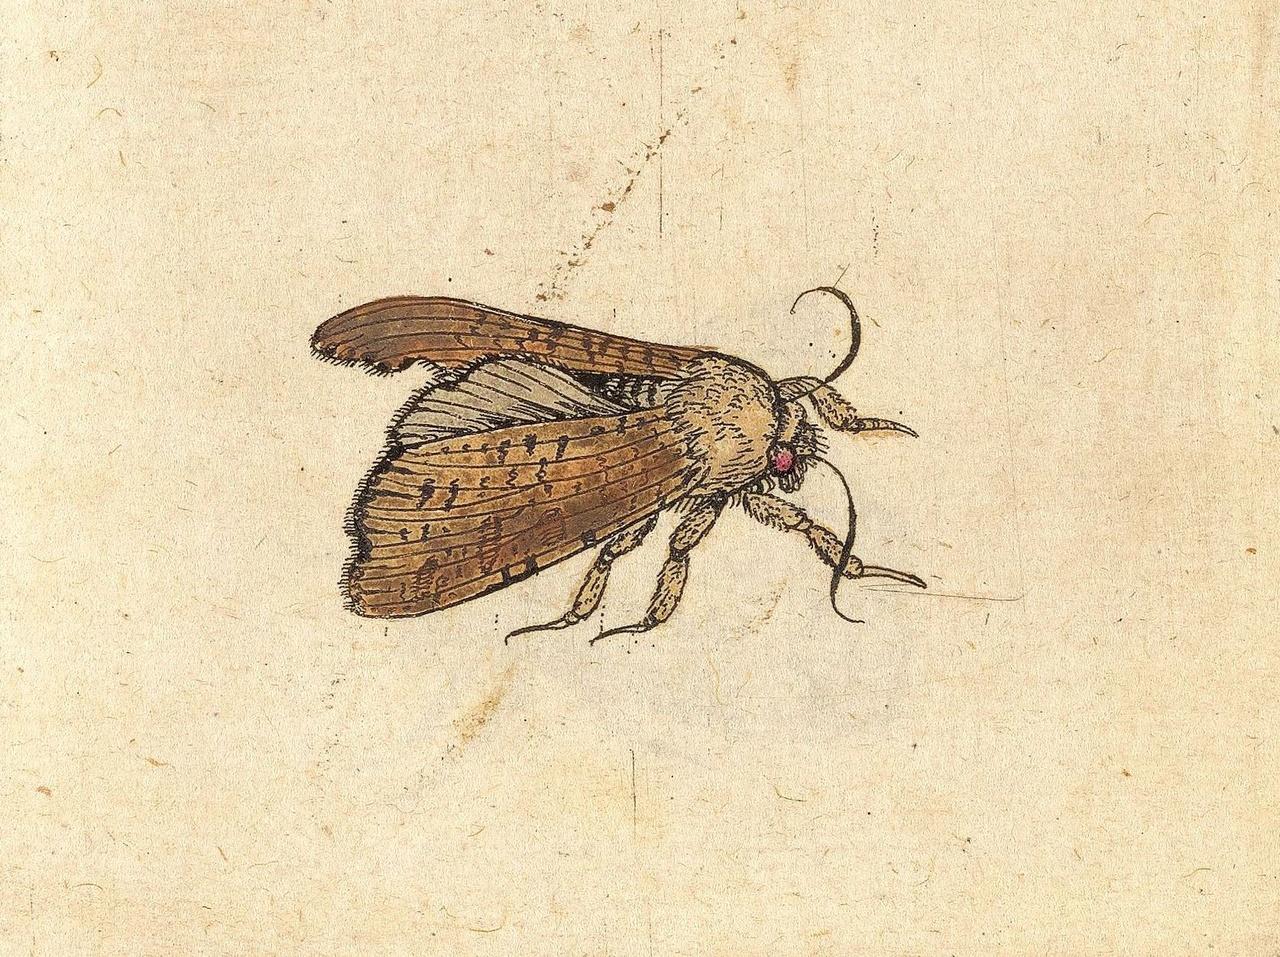 Johannes Goedaert detail Metamorphosis Naturalis deel 1_Zeeuws Museum.jpg